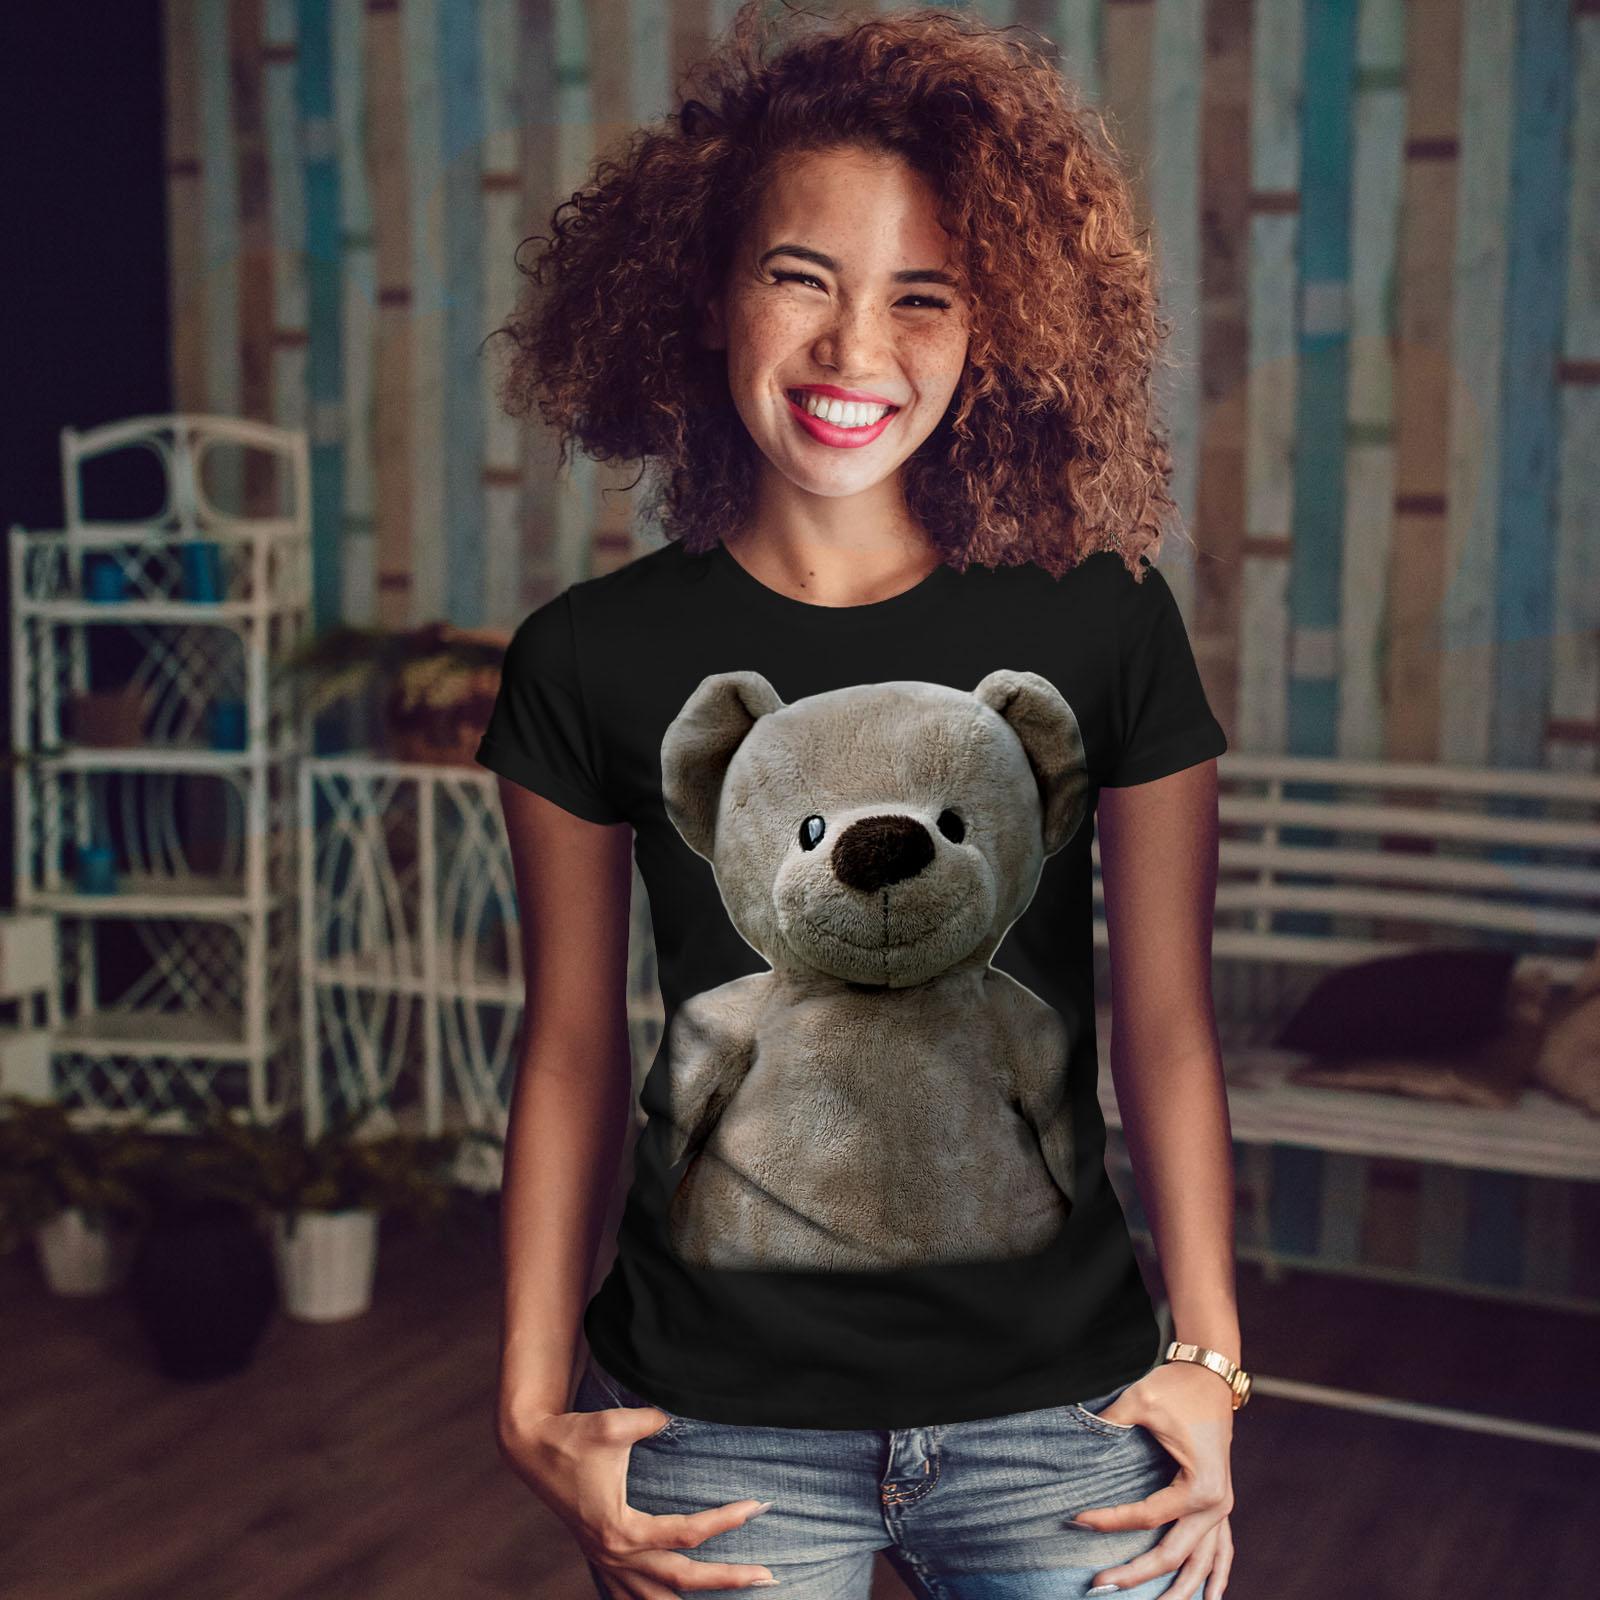 miniature 4 - Wellcoda Cute Plush Womens T-shirt, Teddy Bear Casual Design Printed Tee